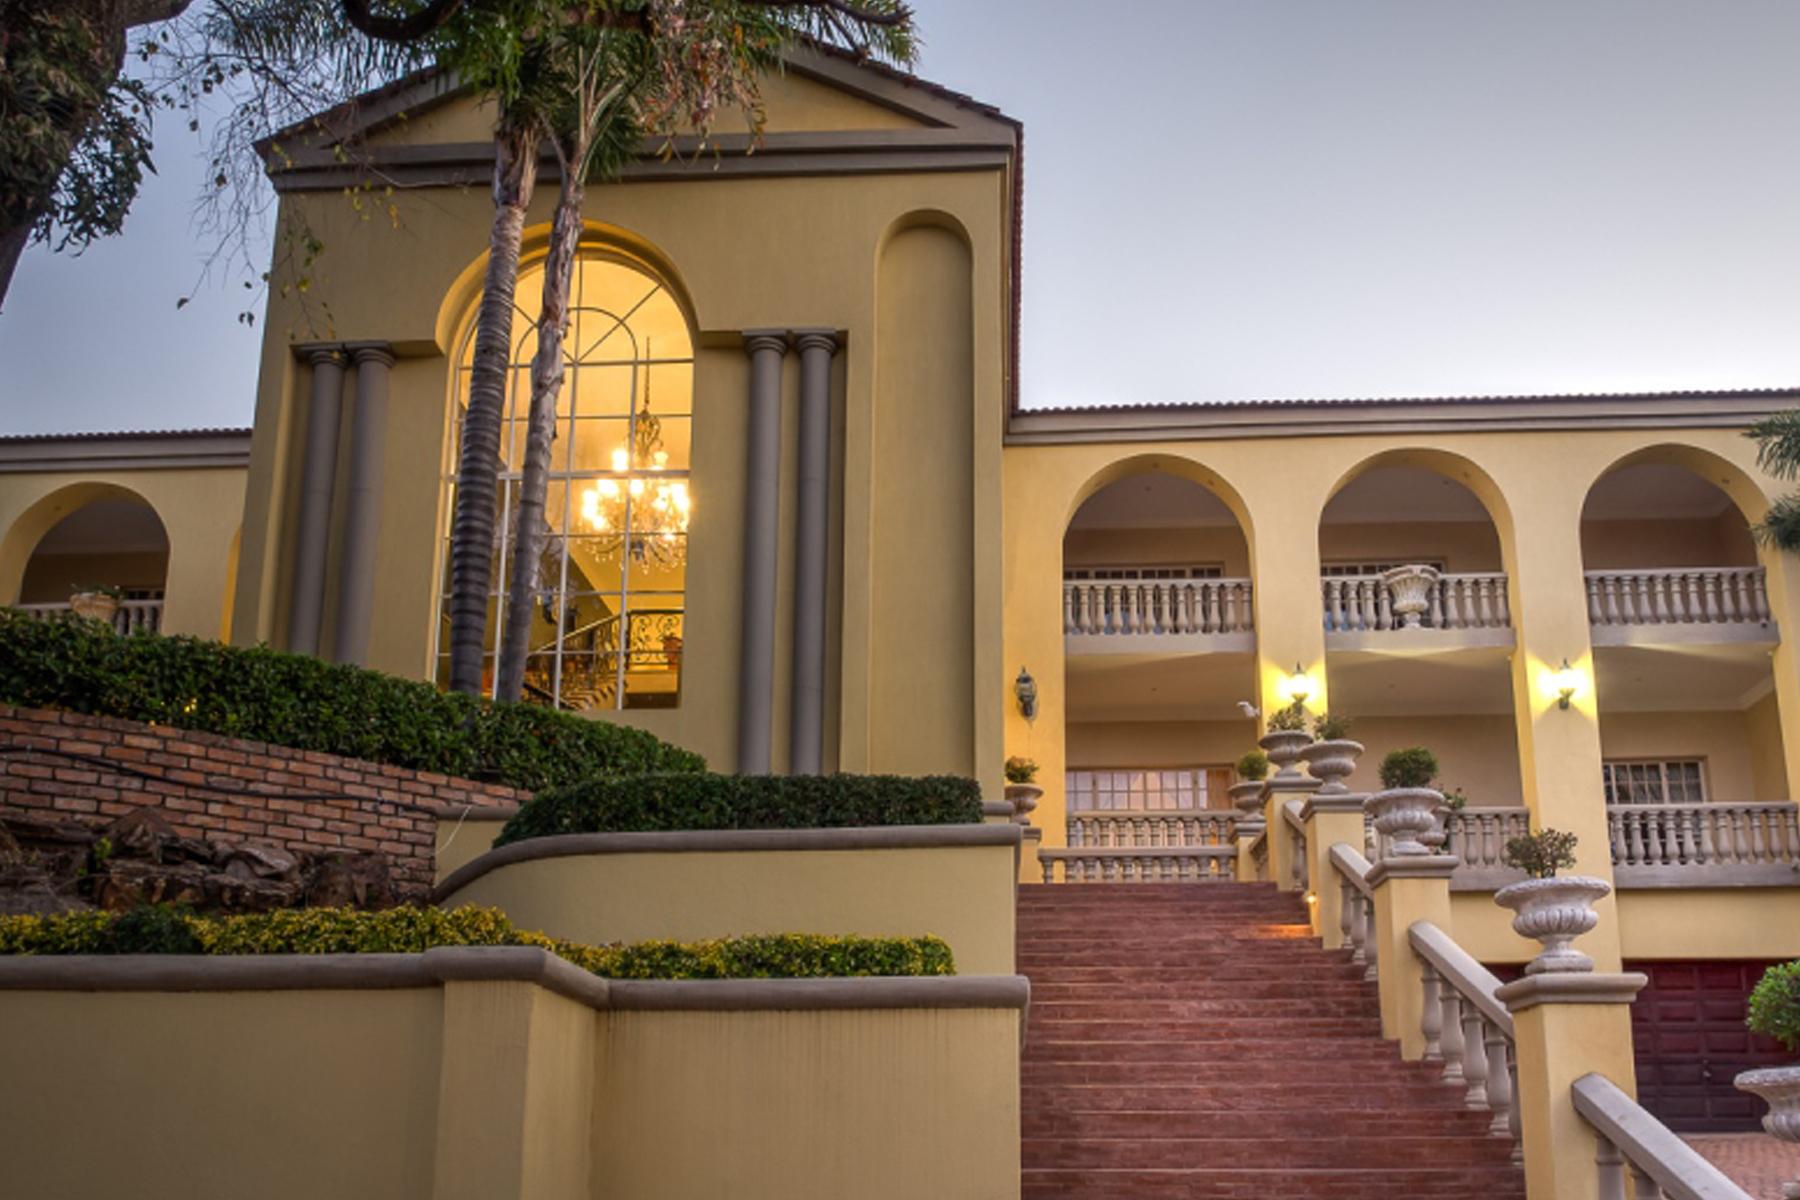 Single Family Home for Sale at Herbert Baker Street Pretoria, Gauteng, 0001 South Africa